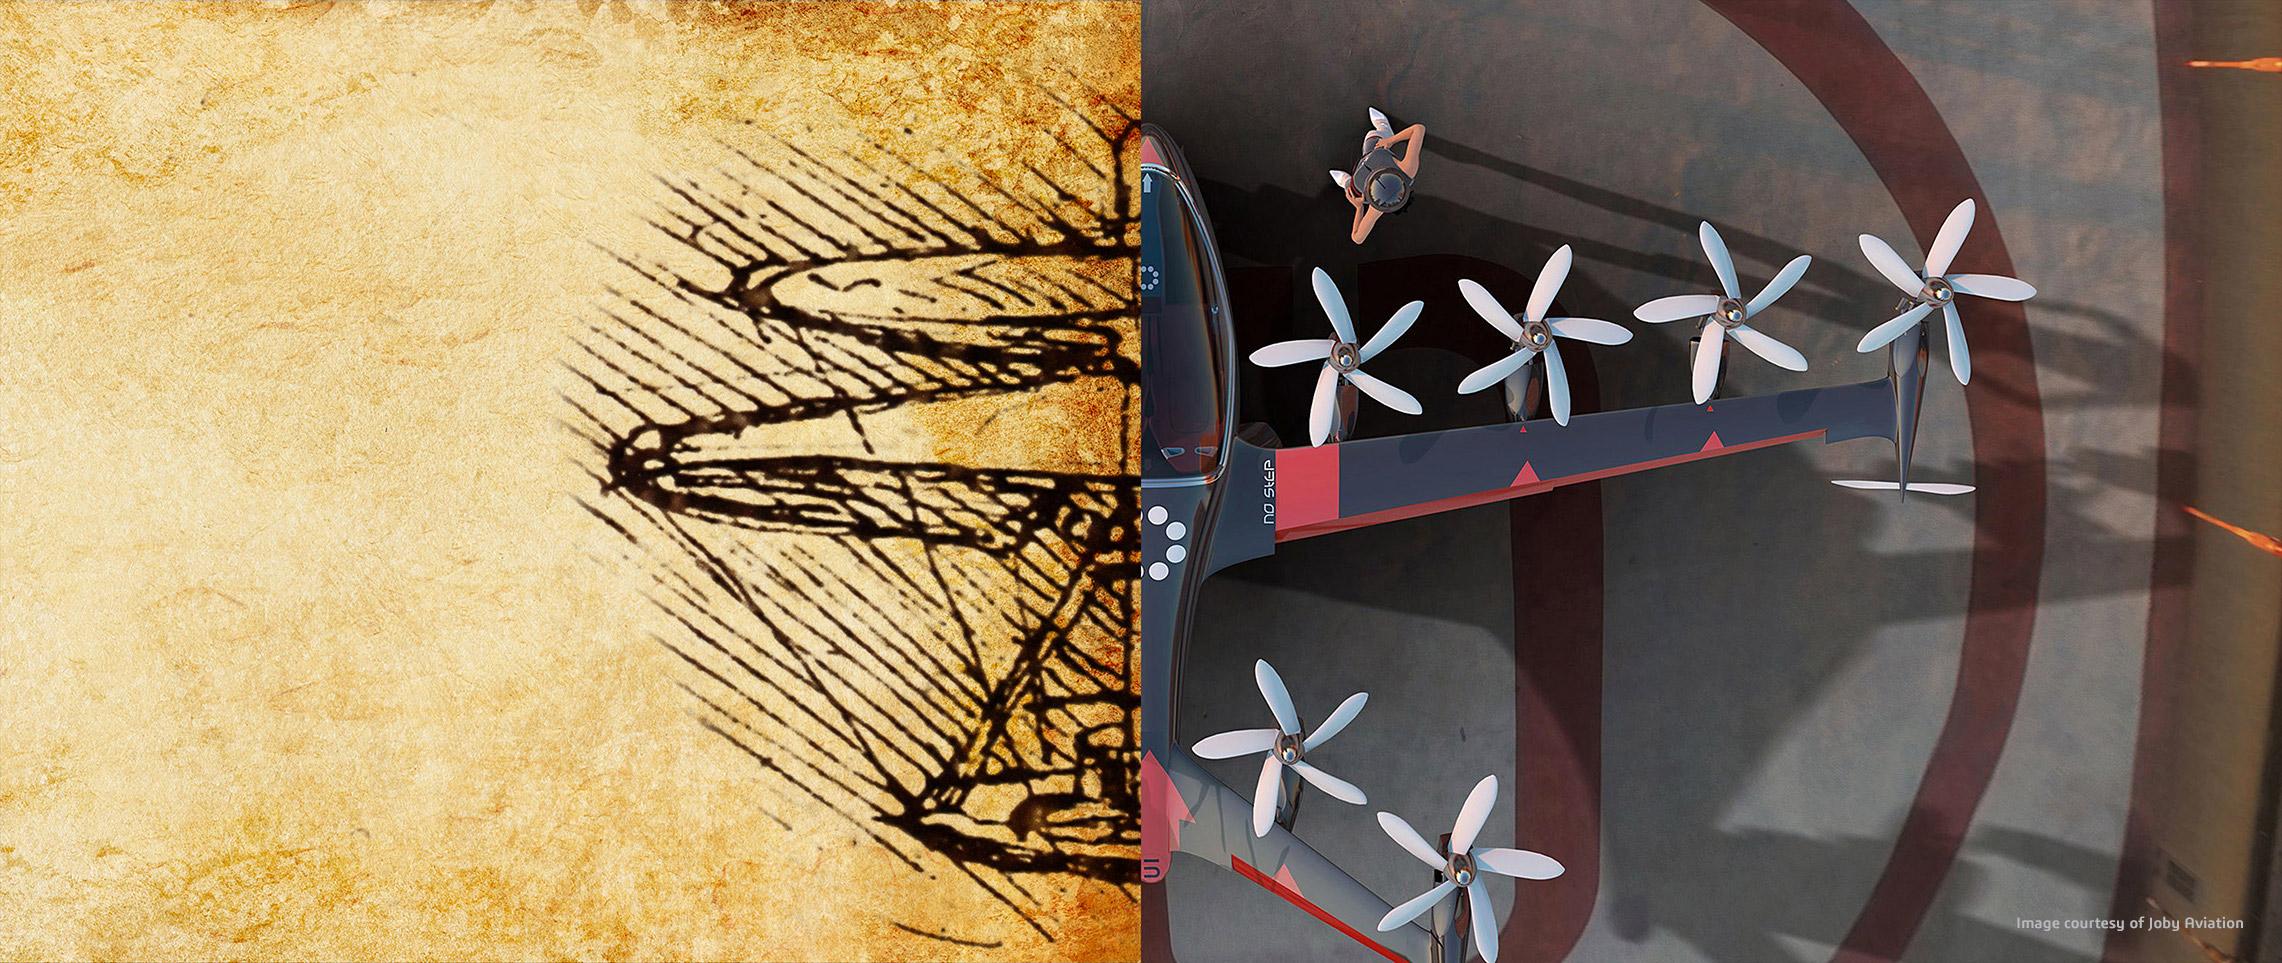 Industrielle Renaissance > joby Aviation > Dassault Systèmes®